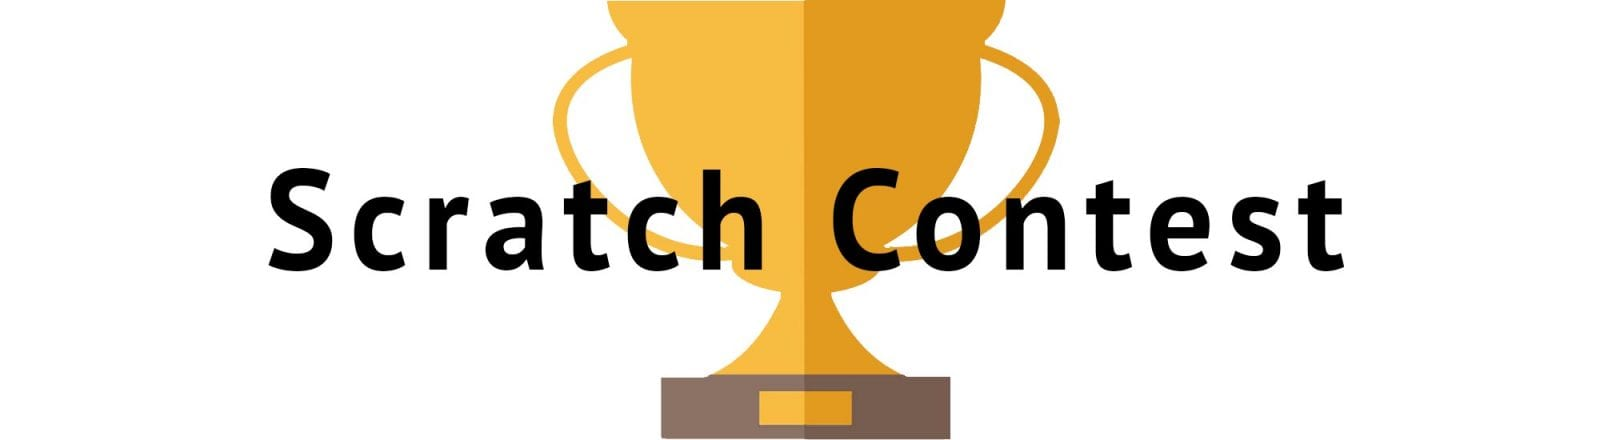 Scratch Contest Logo